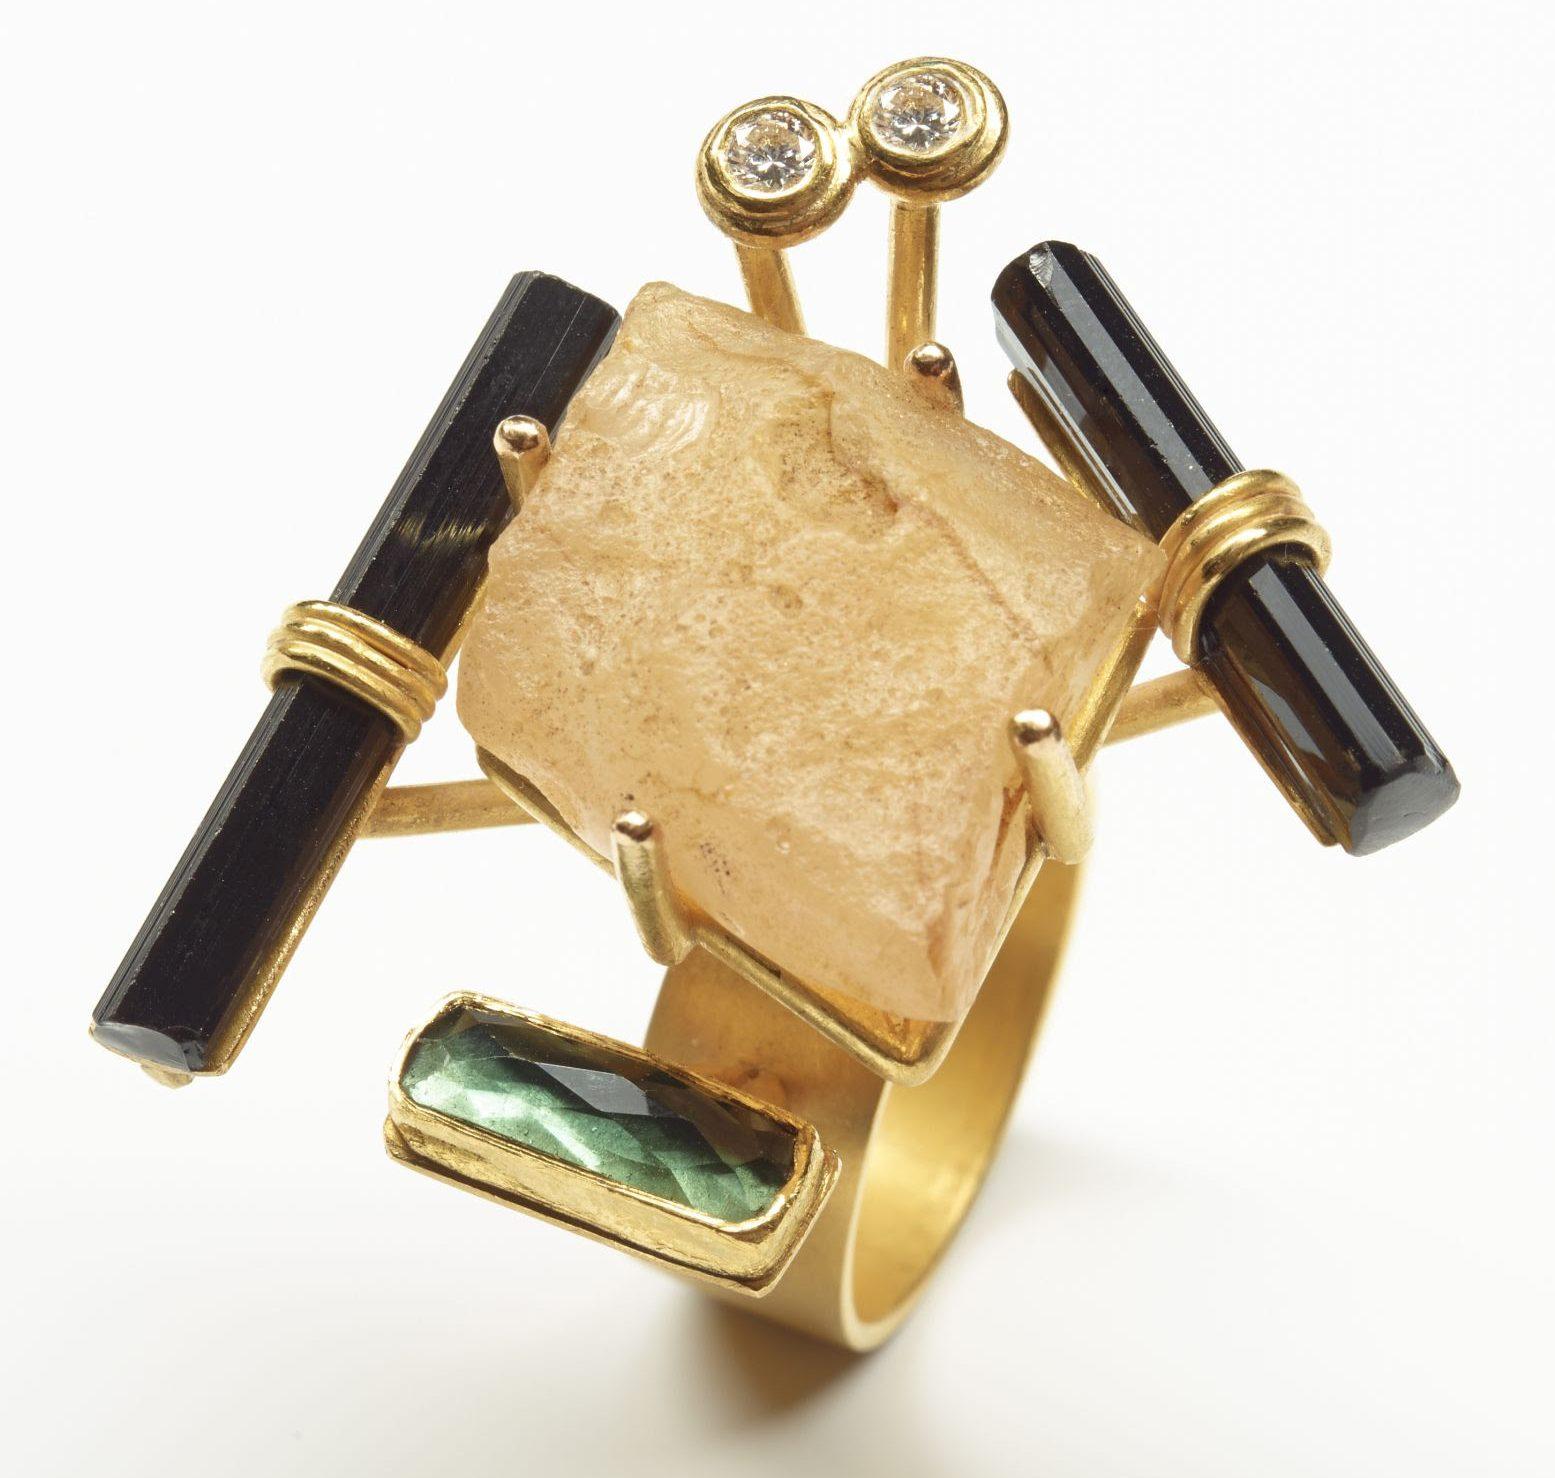 Rike Bartels, Trotzki, ring, 2014, goud, stenen